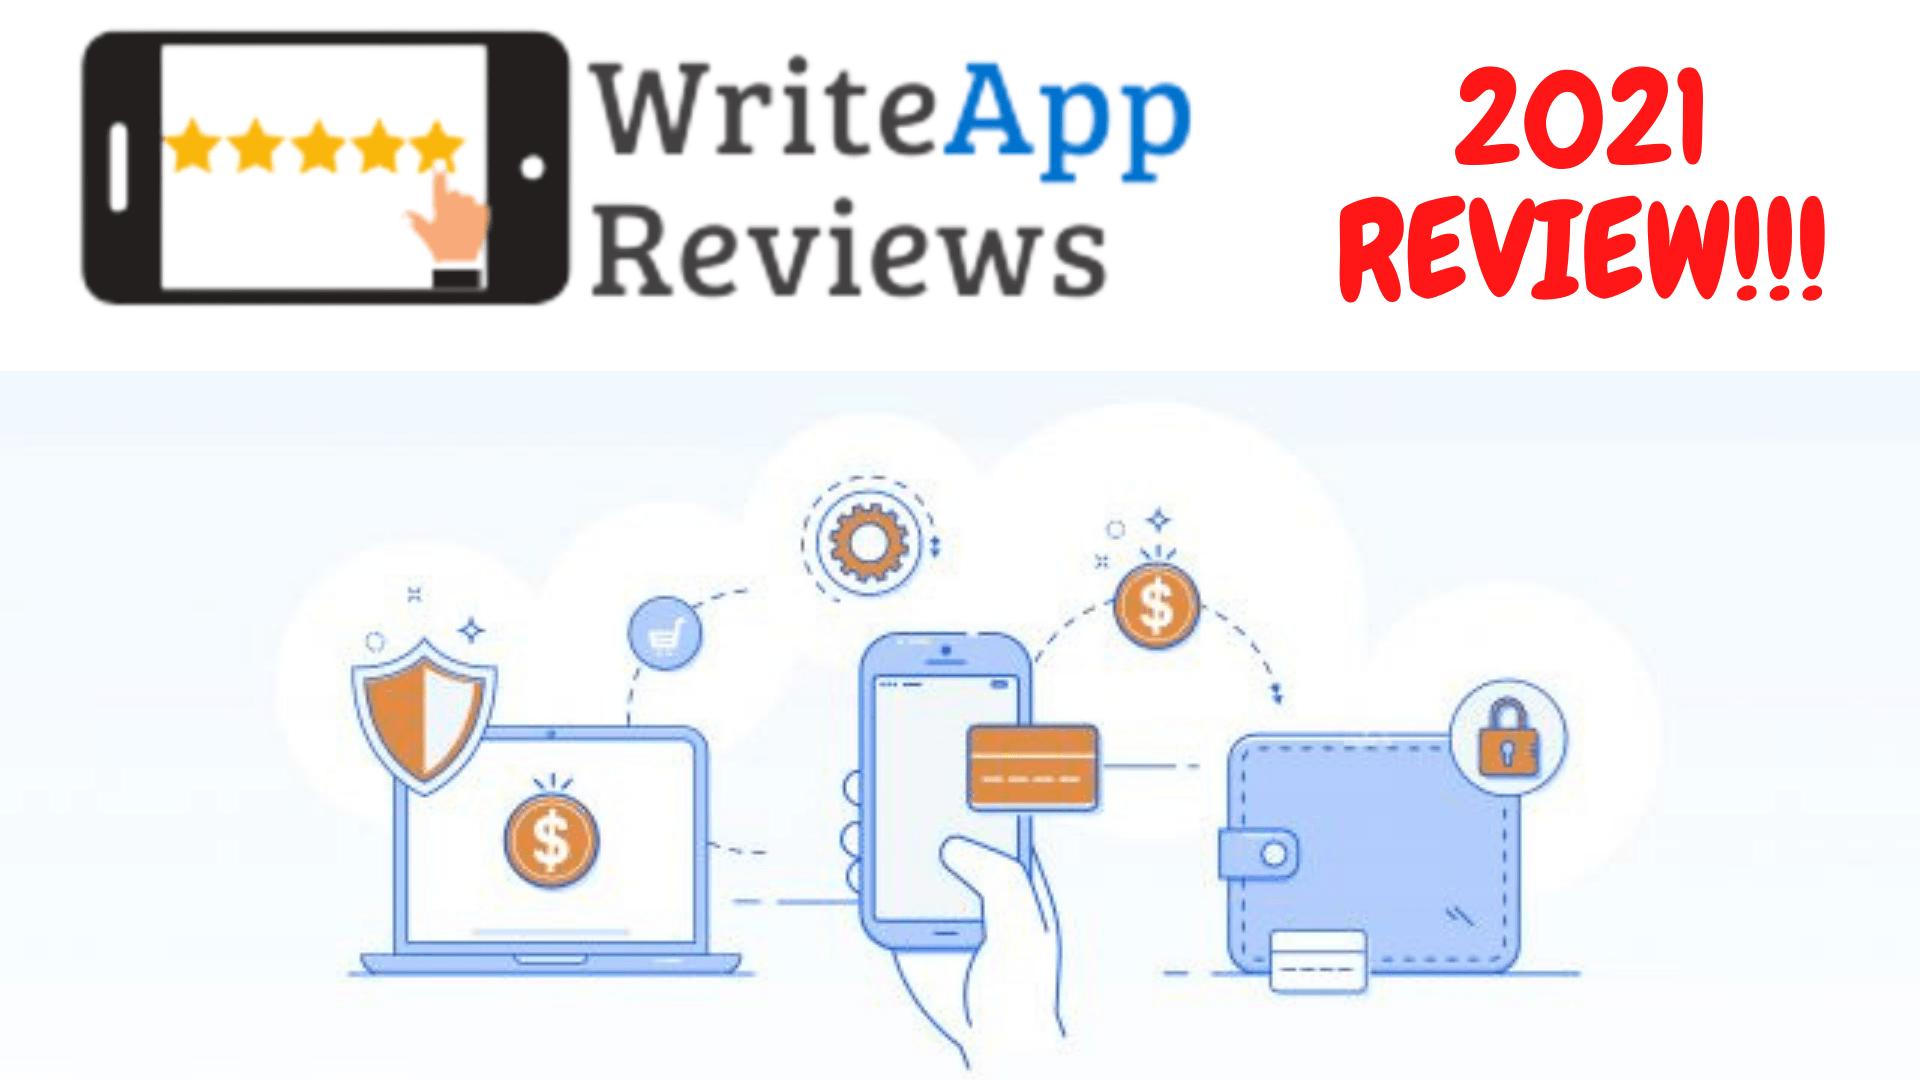 WriteApp Reviews Logo FRONTPAGE